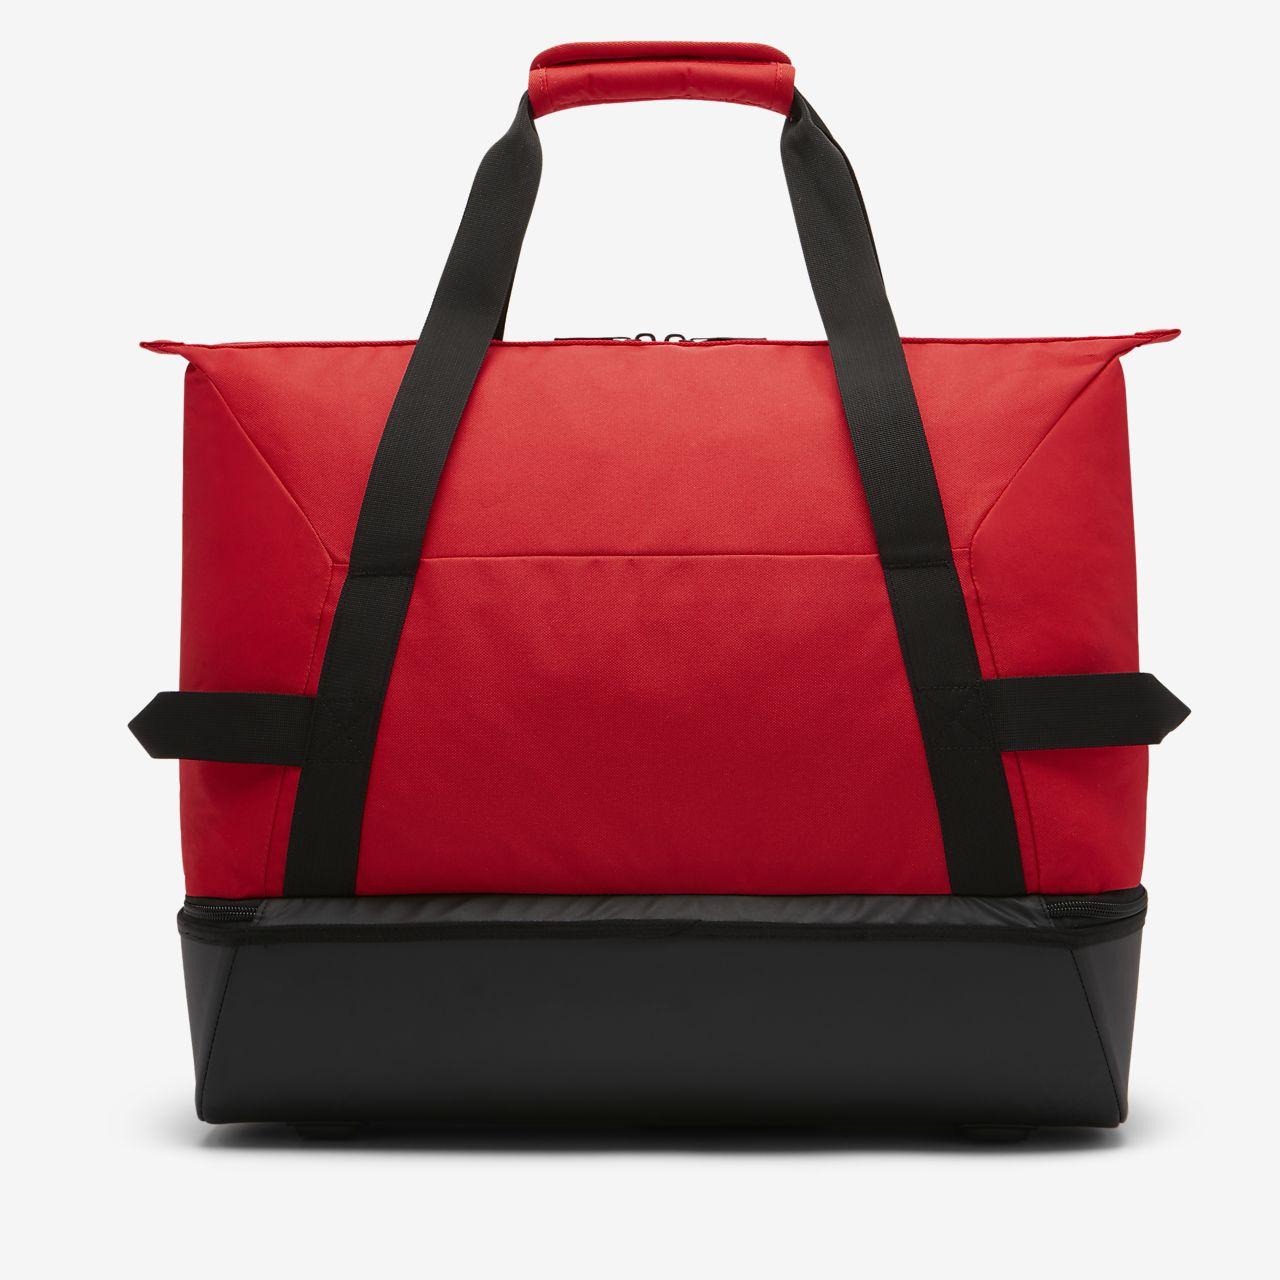 56ef90aa0865 ... Nike Academy Team Hardcase (Large) Football Duffel Bag